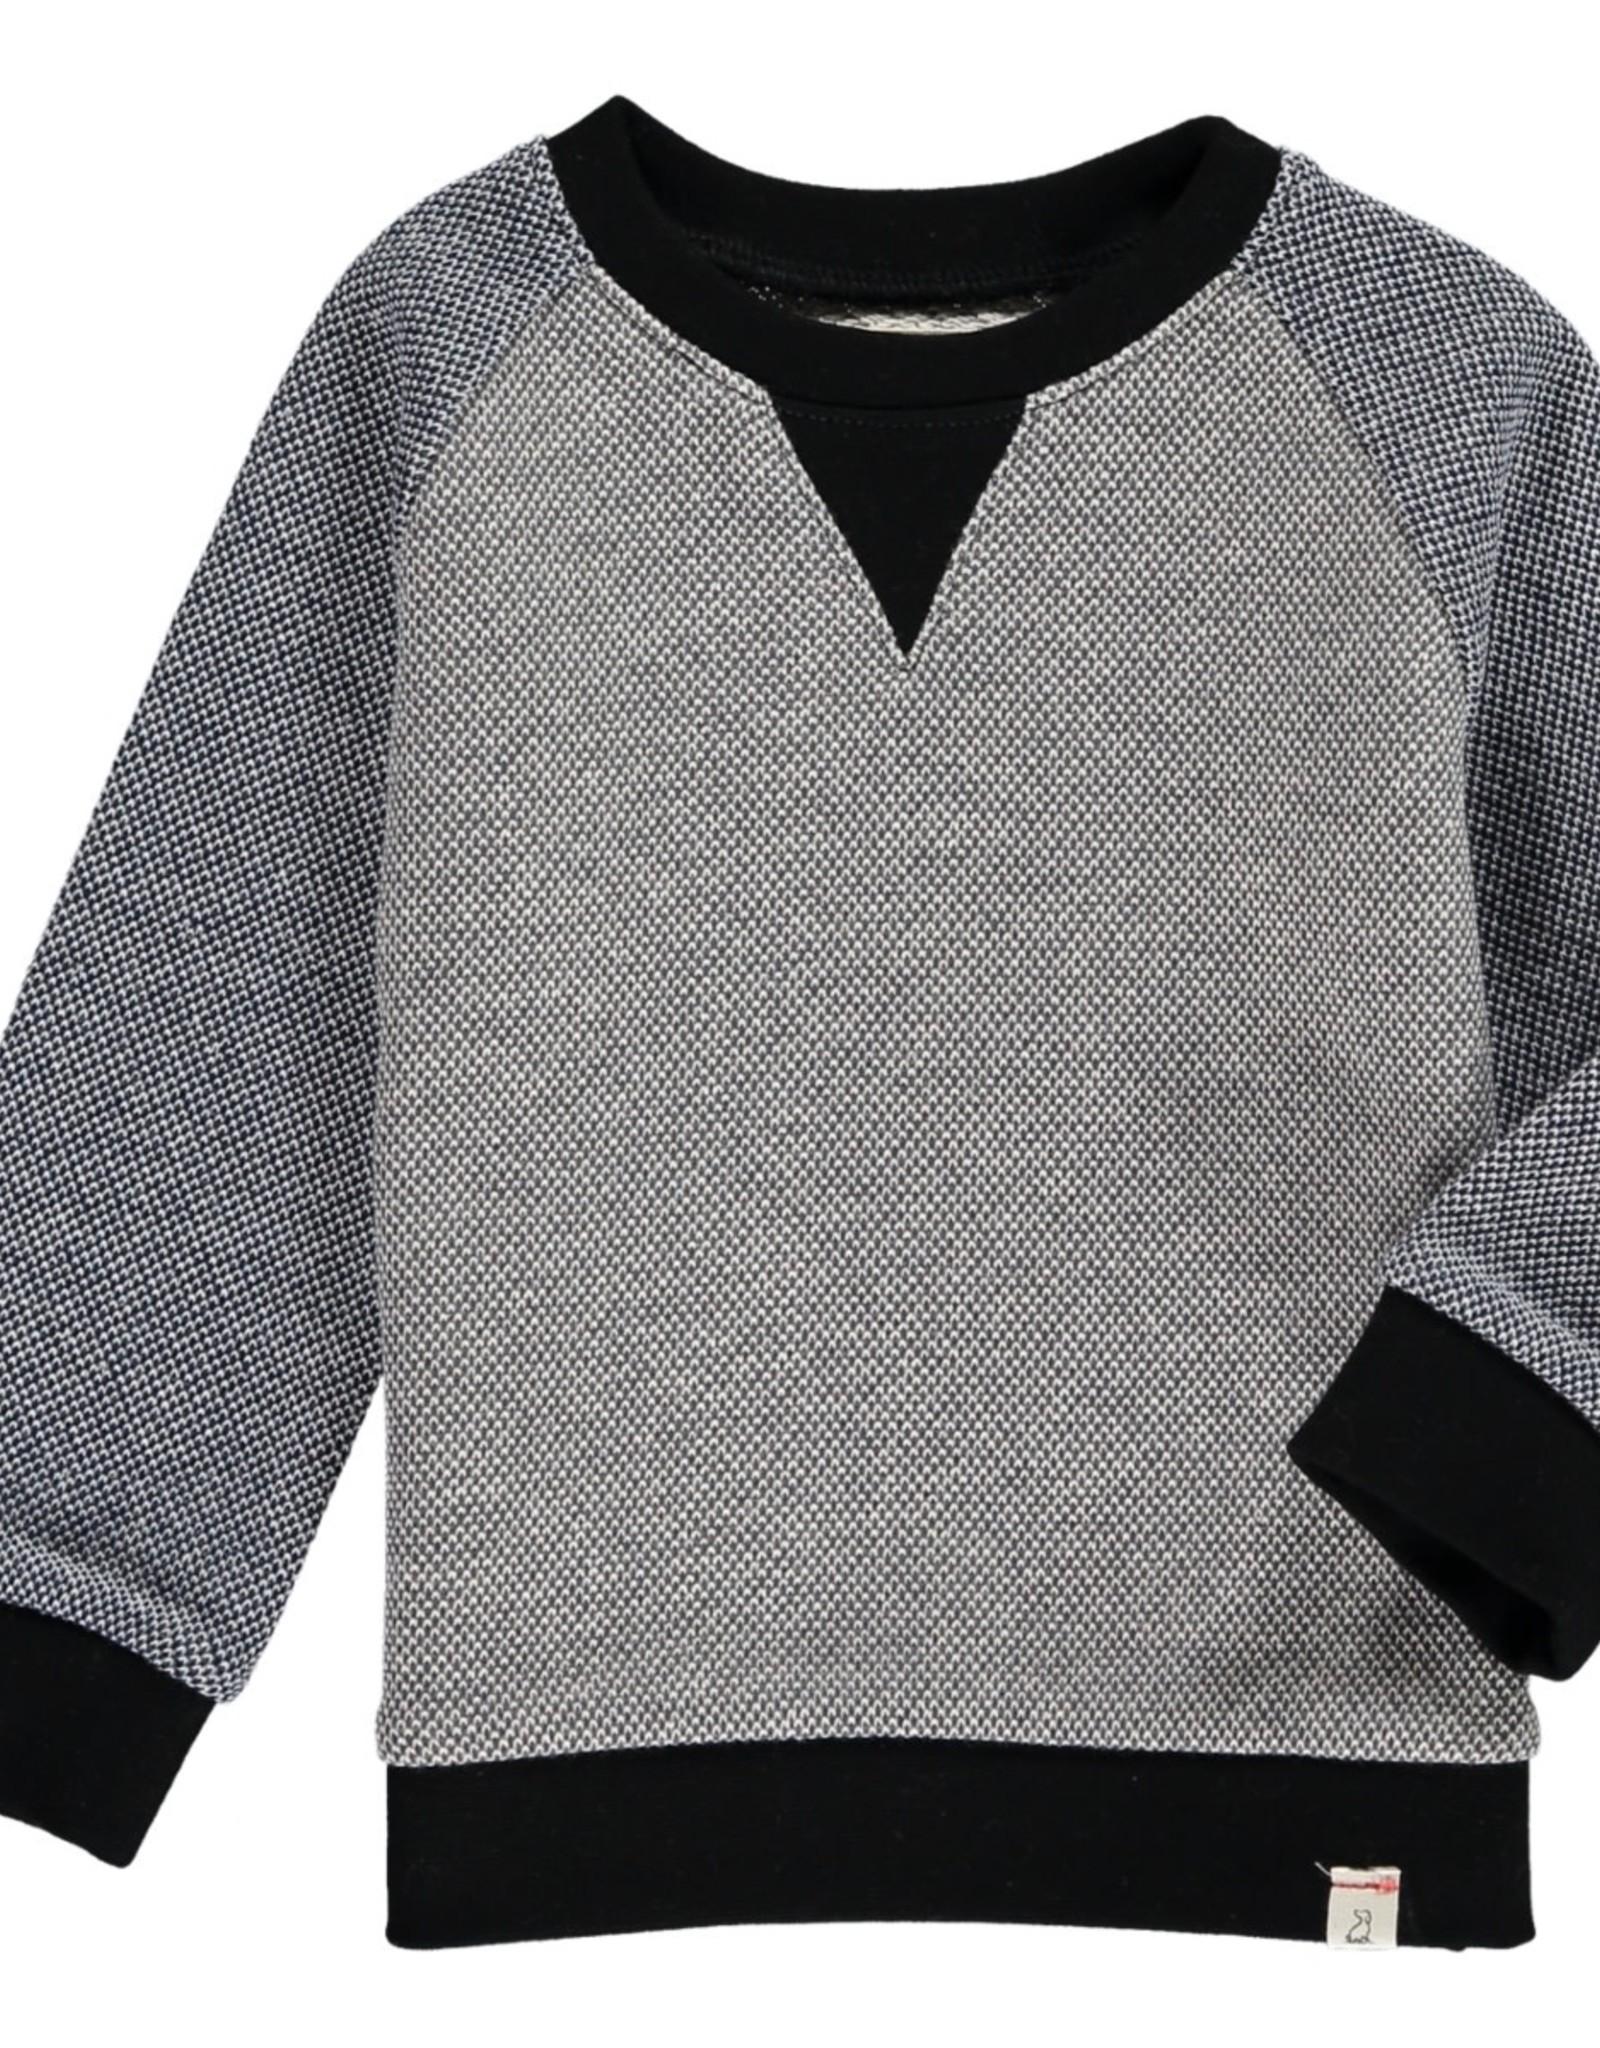 Grey/Blue raglan sweat top